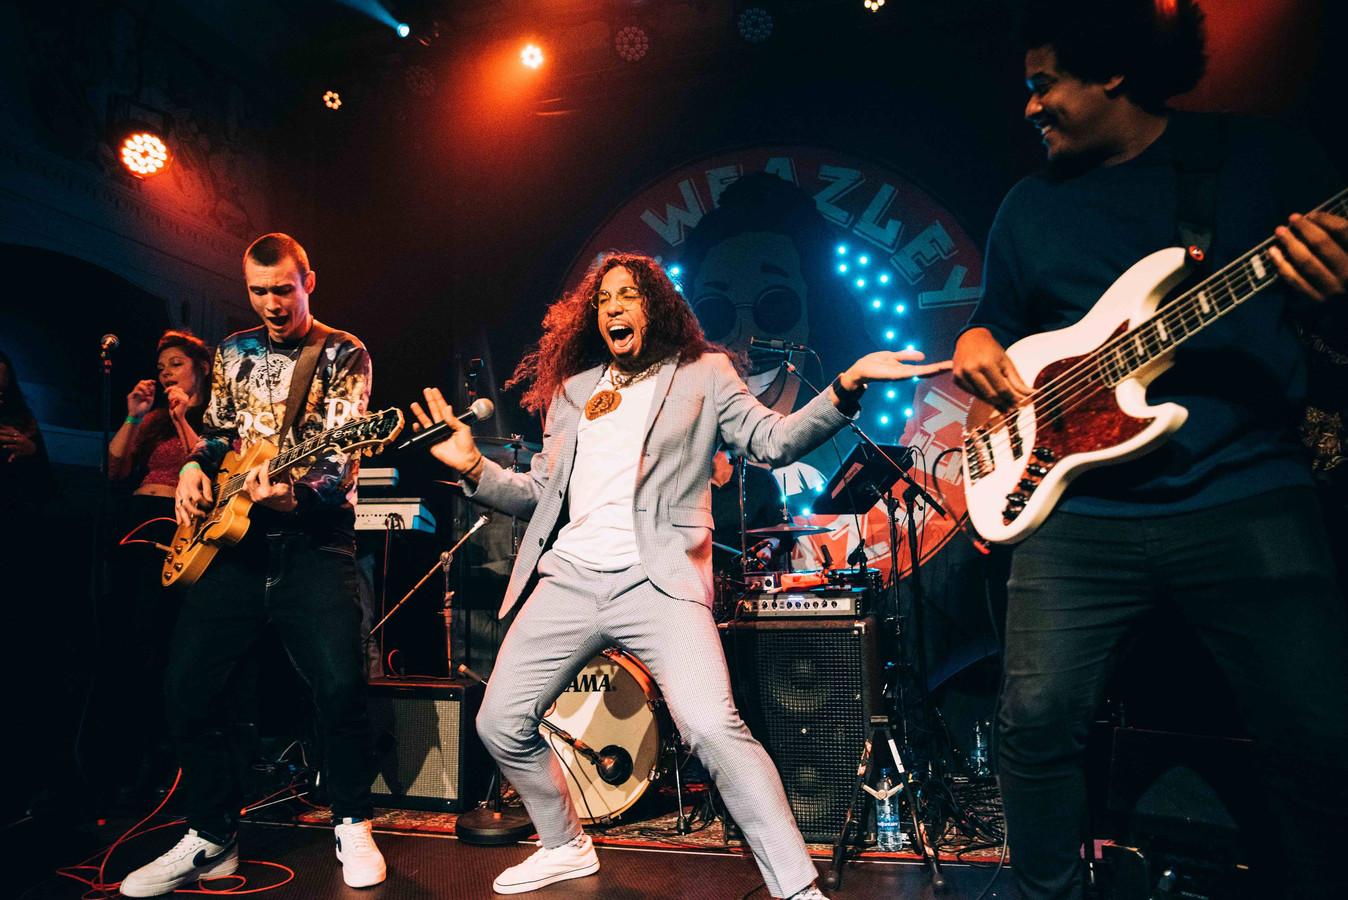 De Arnhemse band Mr. Weazley mixt hiphop, reggae, afrobeat en 'spoken word'.